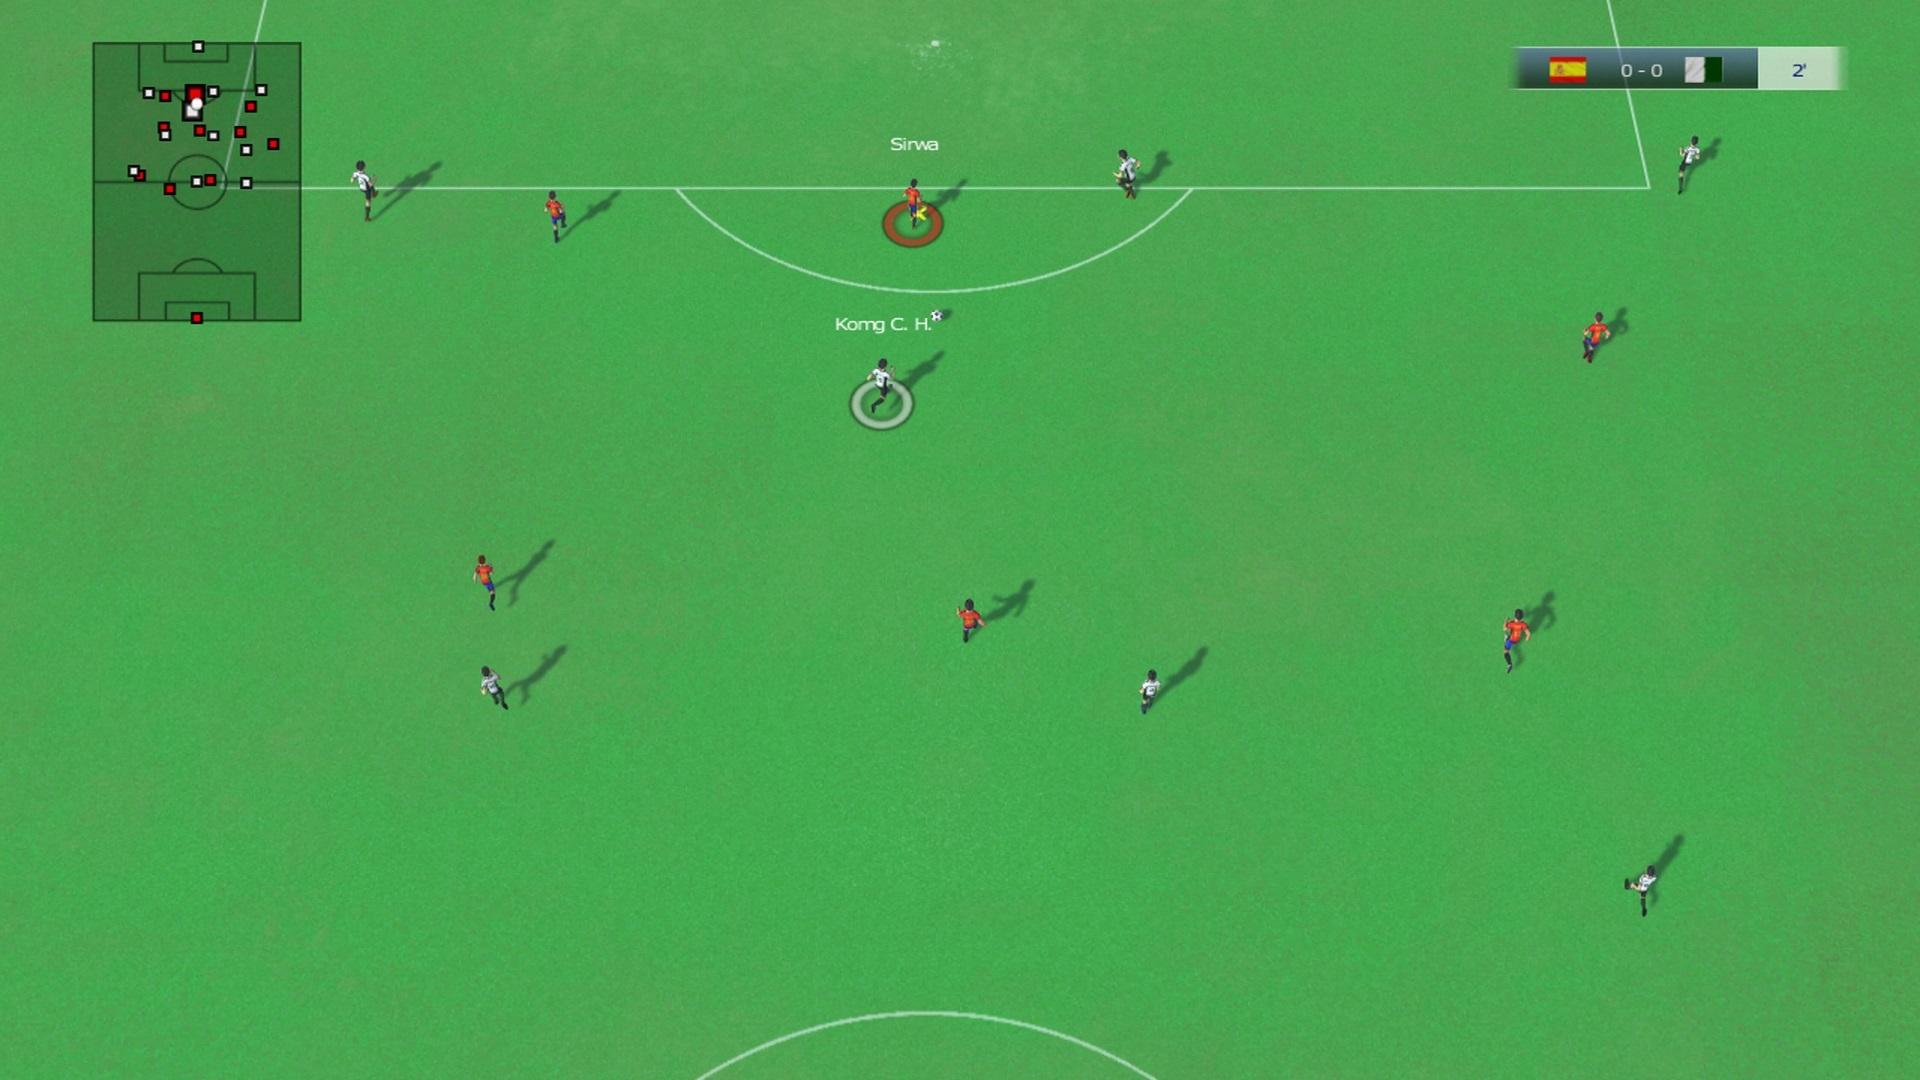 Active_Soccer_2_DX_SS_1.jpg